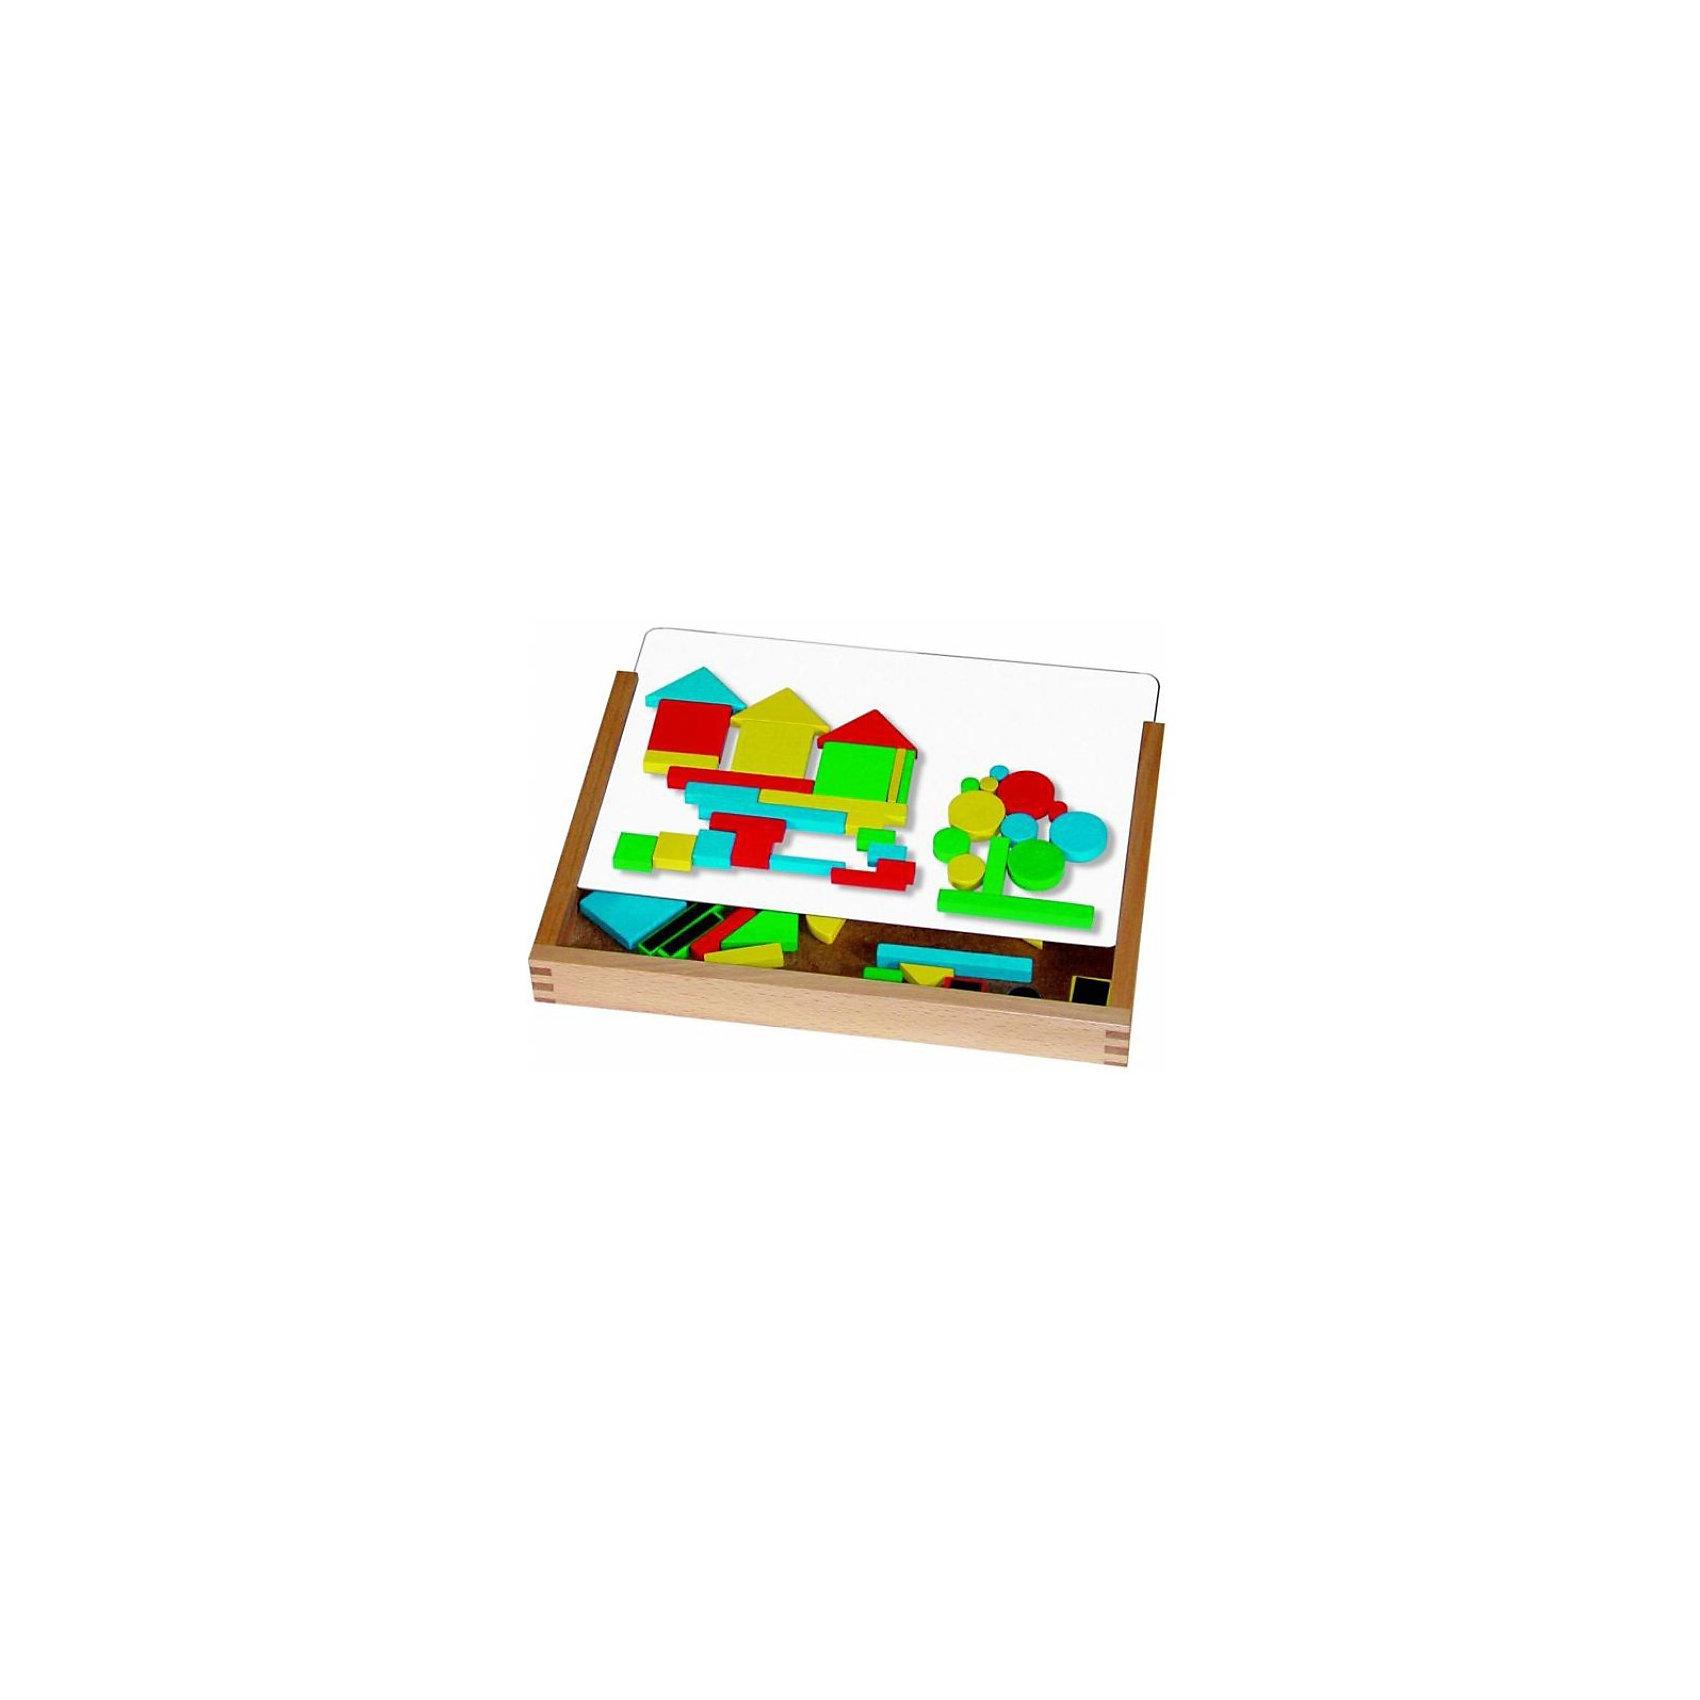 Магнитная игра с полем и  геометрическими фигурами, Magnetspiele